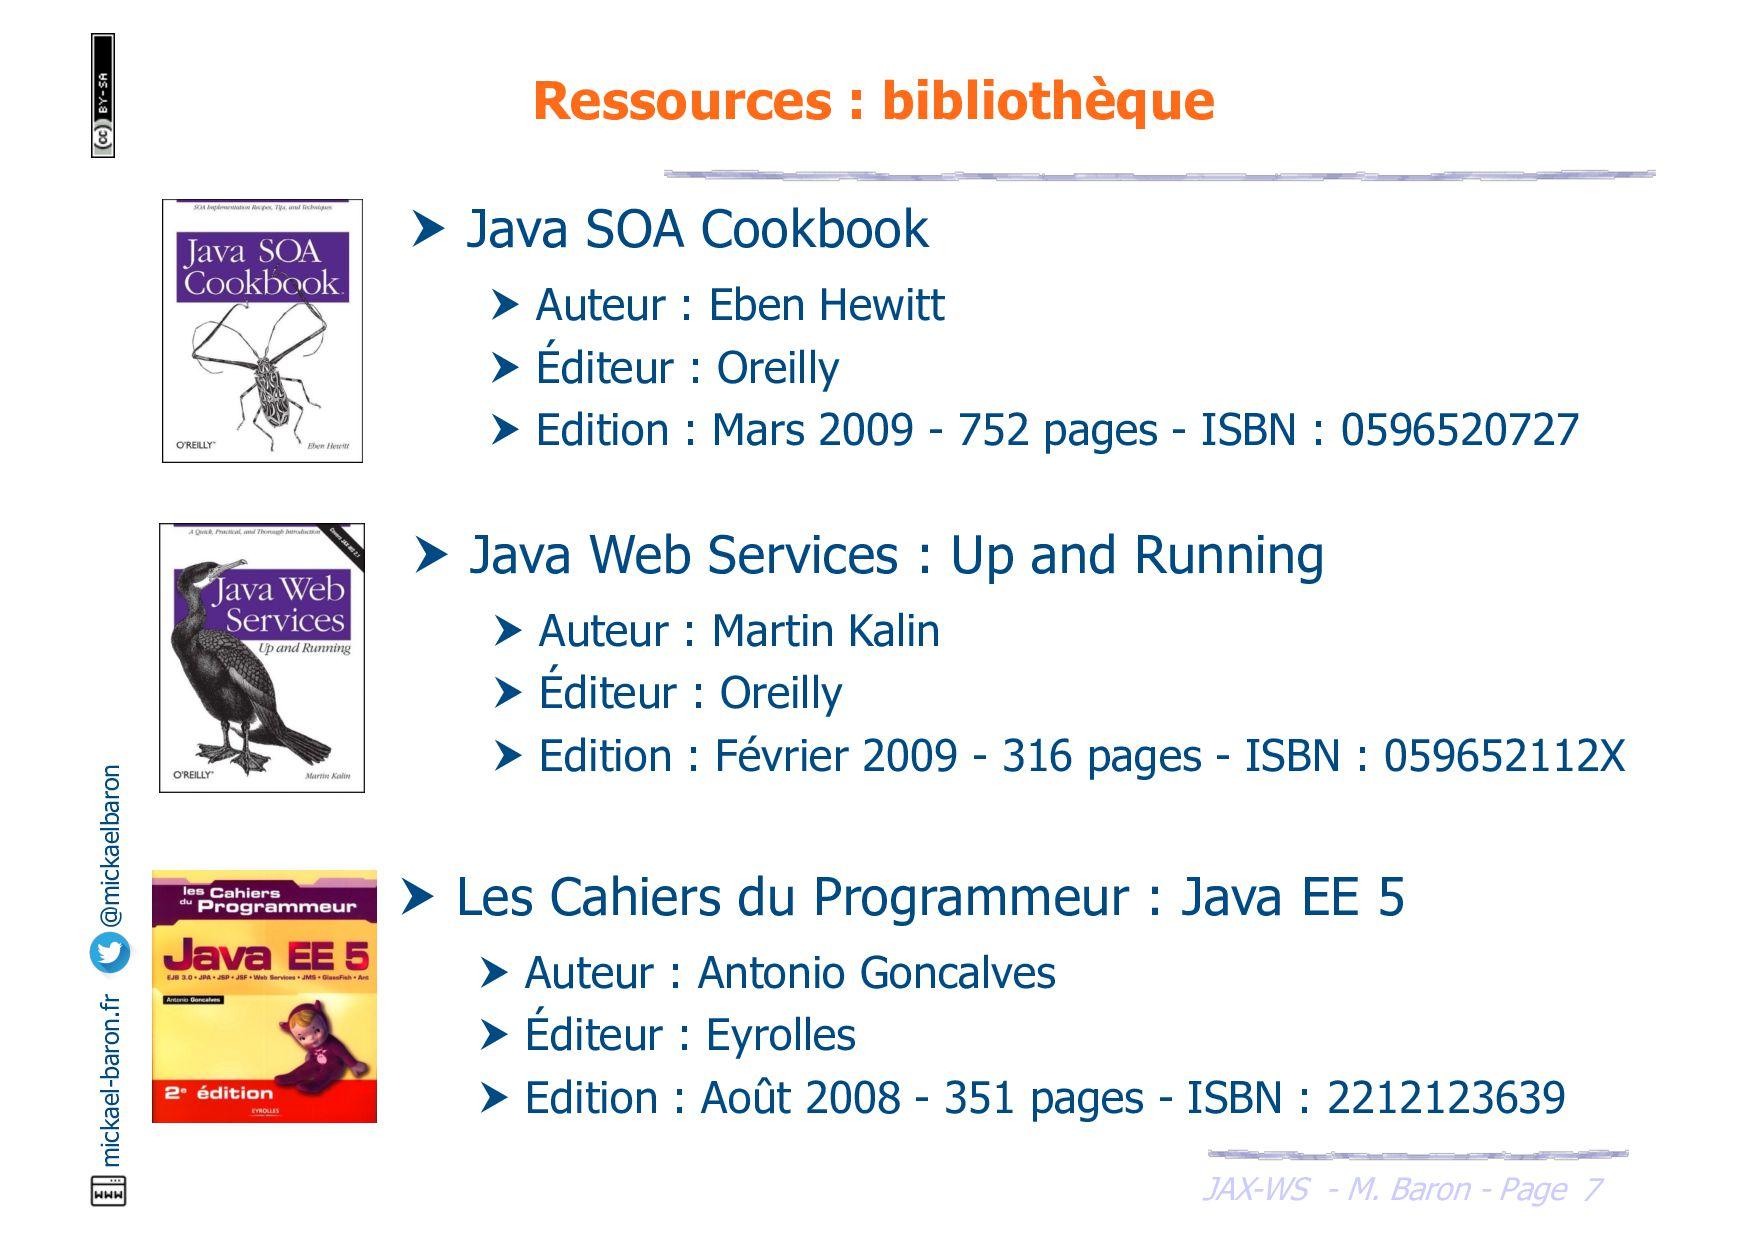 JAX-WS - M. Baron - Page mickael-baron.fr @mick...